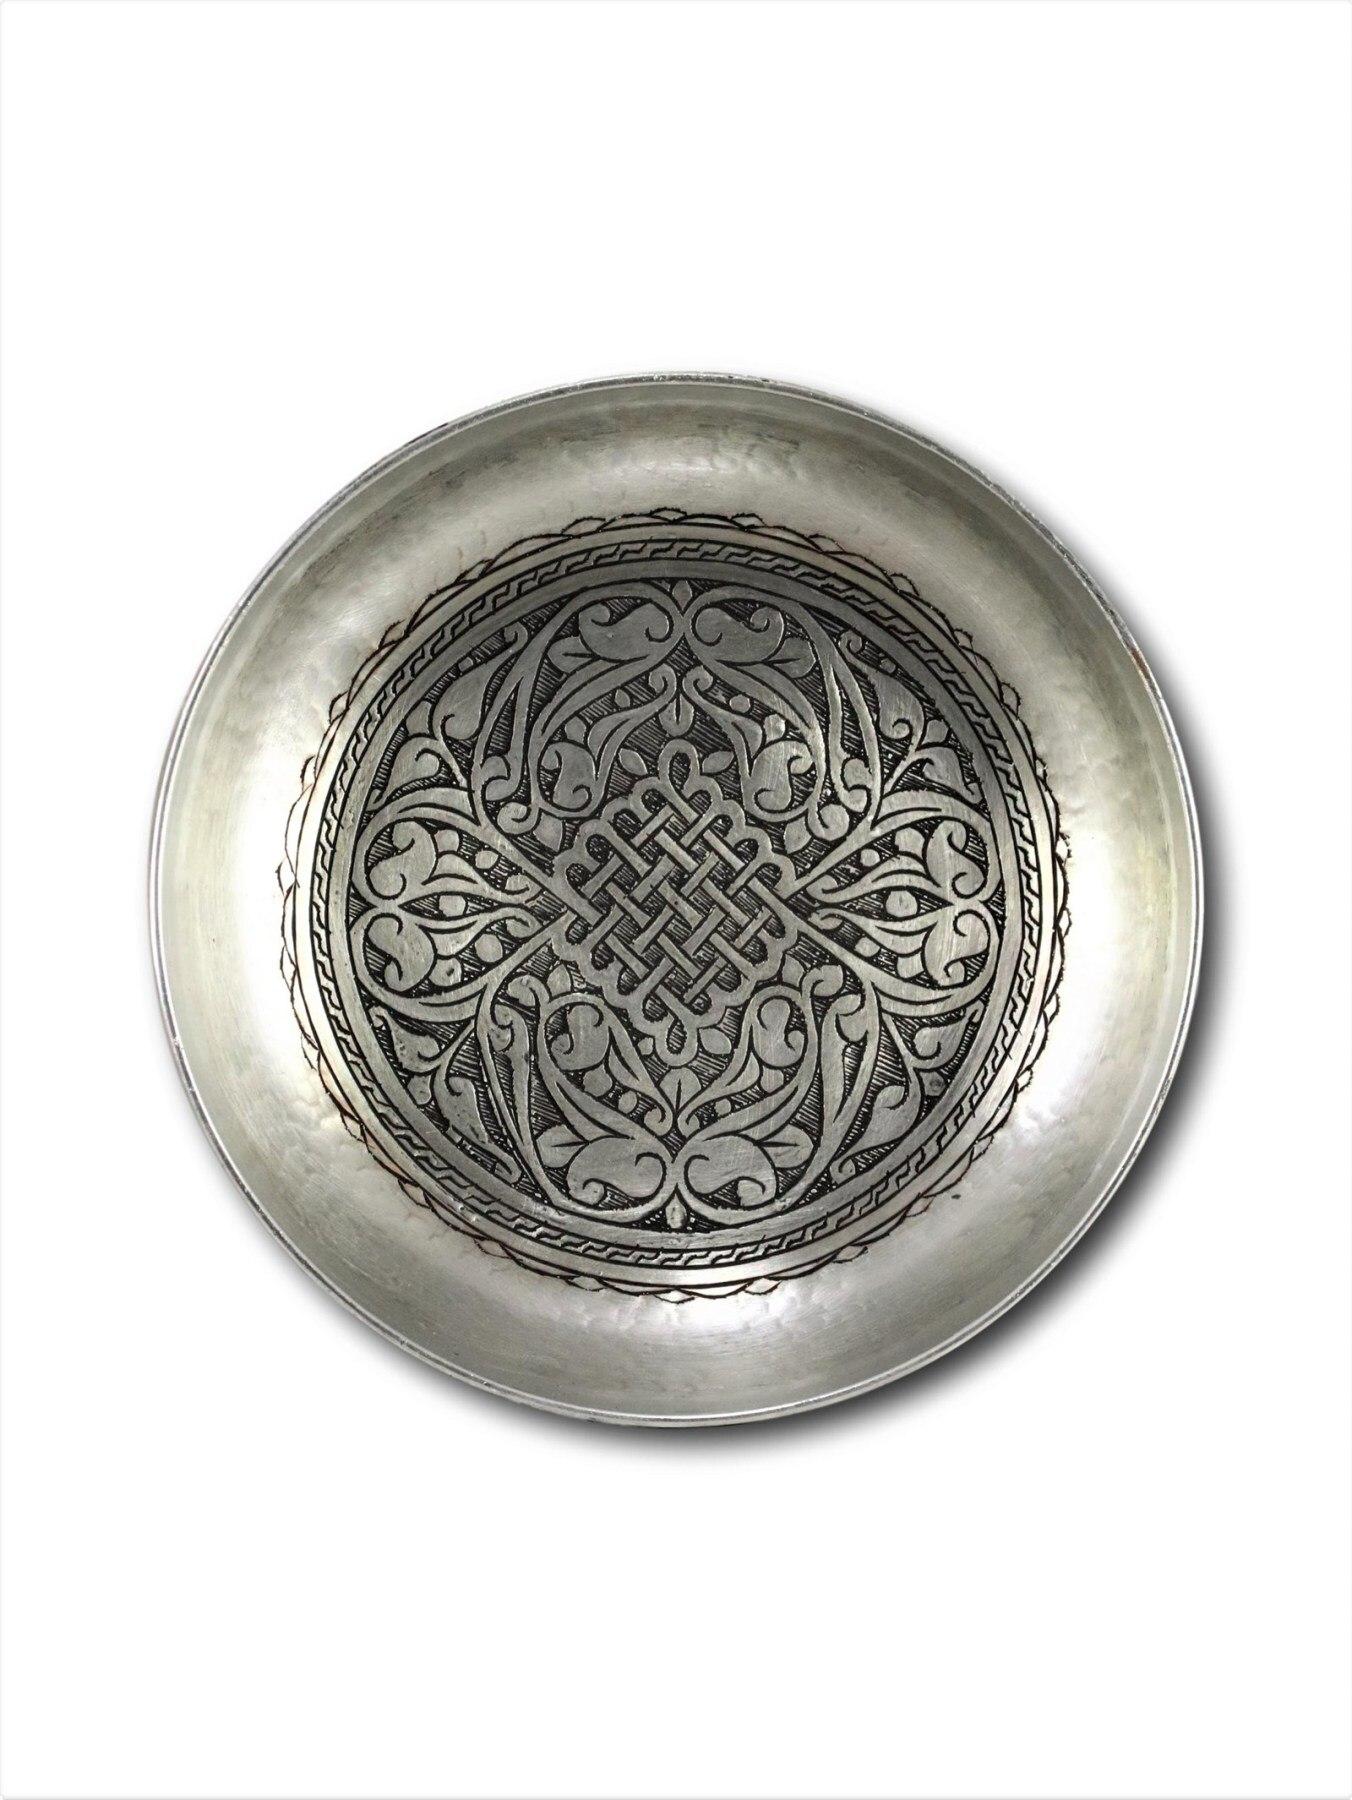 Morya Copper Turkish 2baths Bowl Luxory Bathroom Accessories Elegant Decorative Hammared Handmade Decor Vintage 20 cm